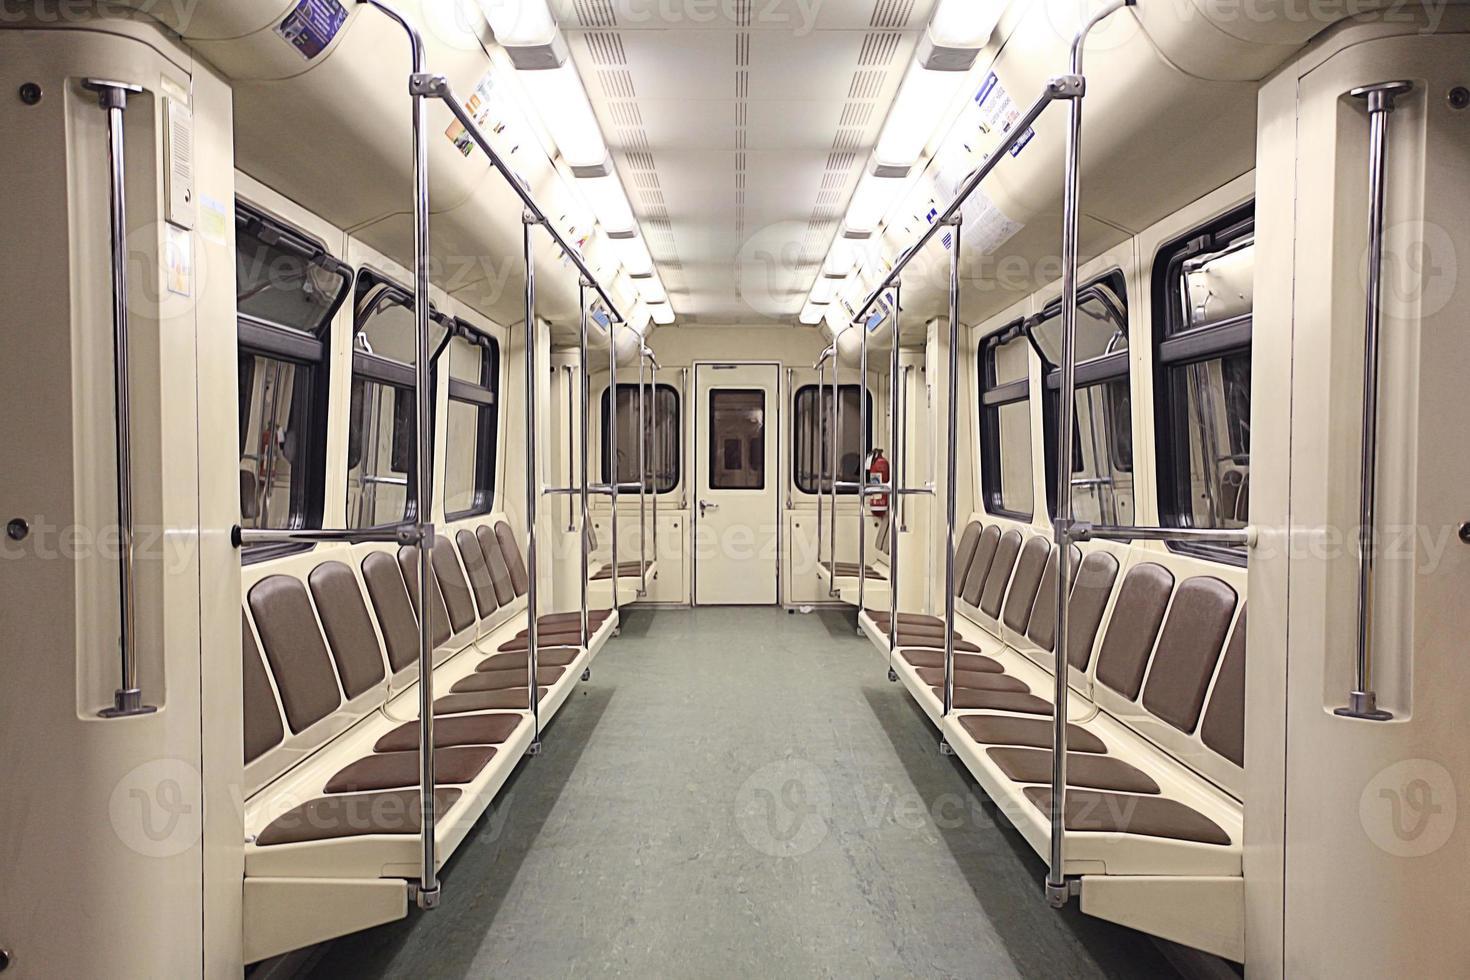 train inside the empty car photo